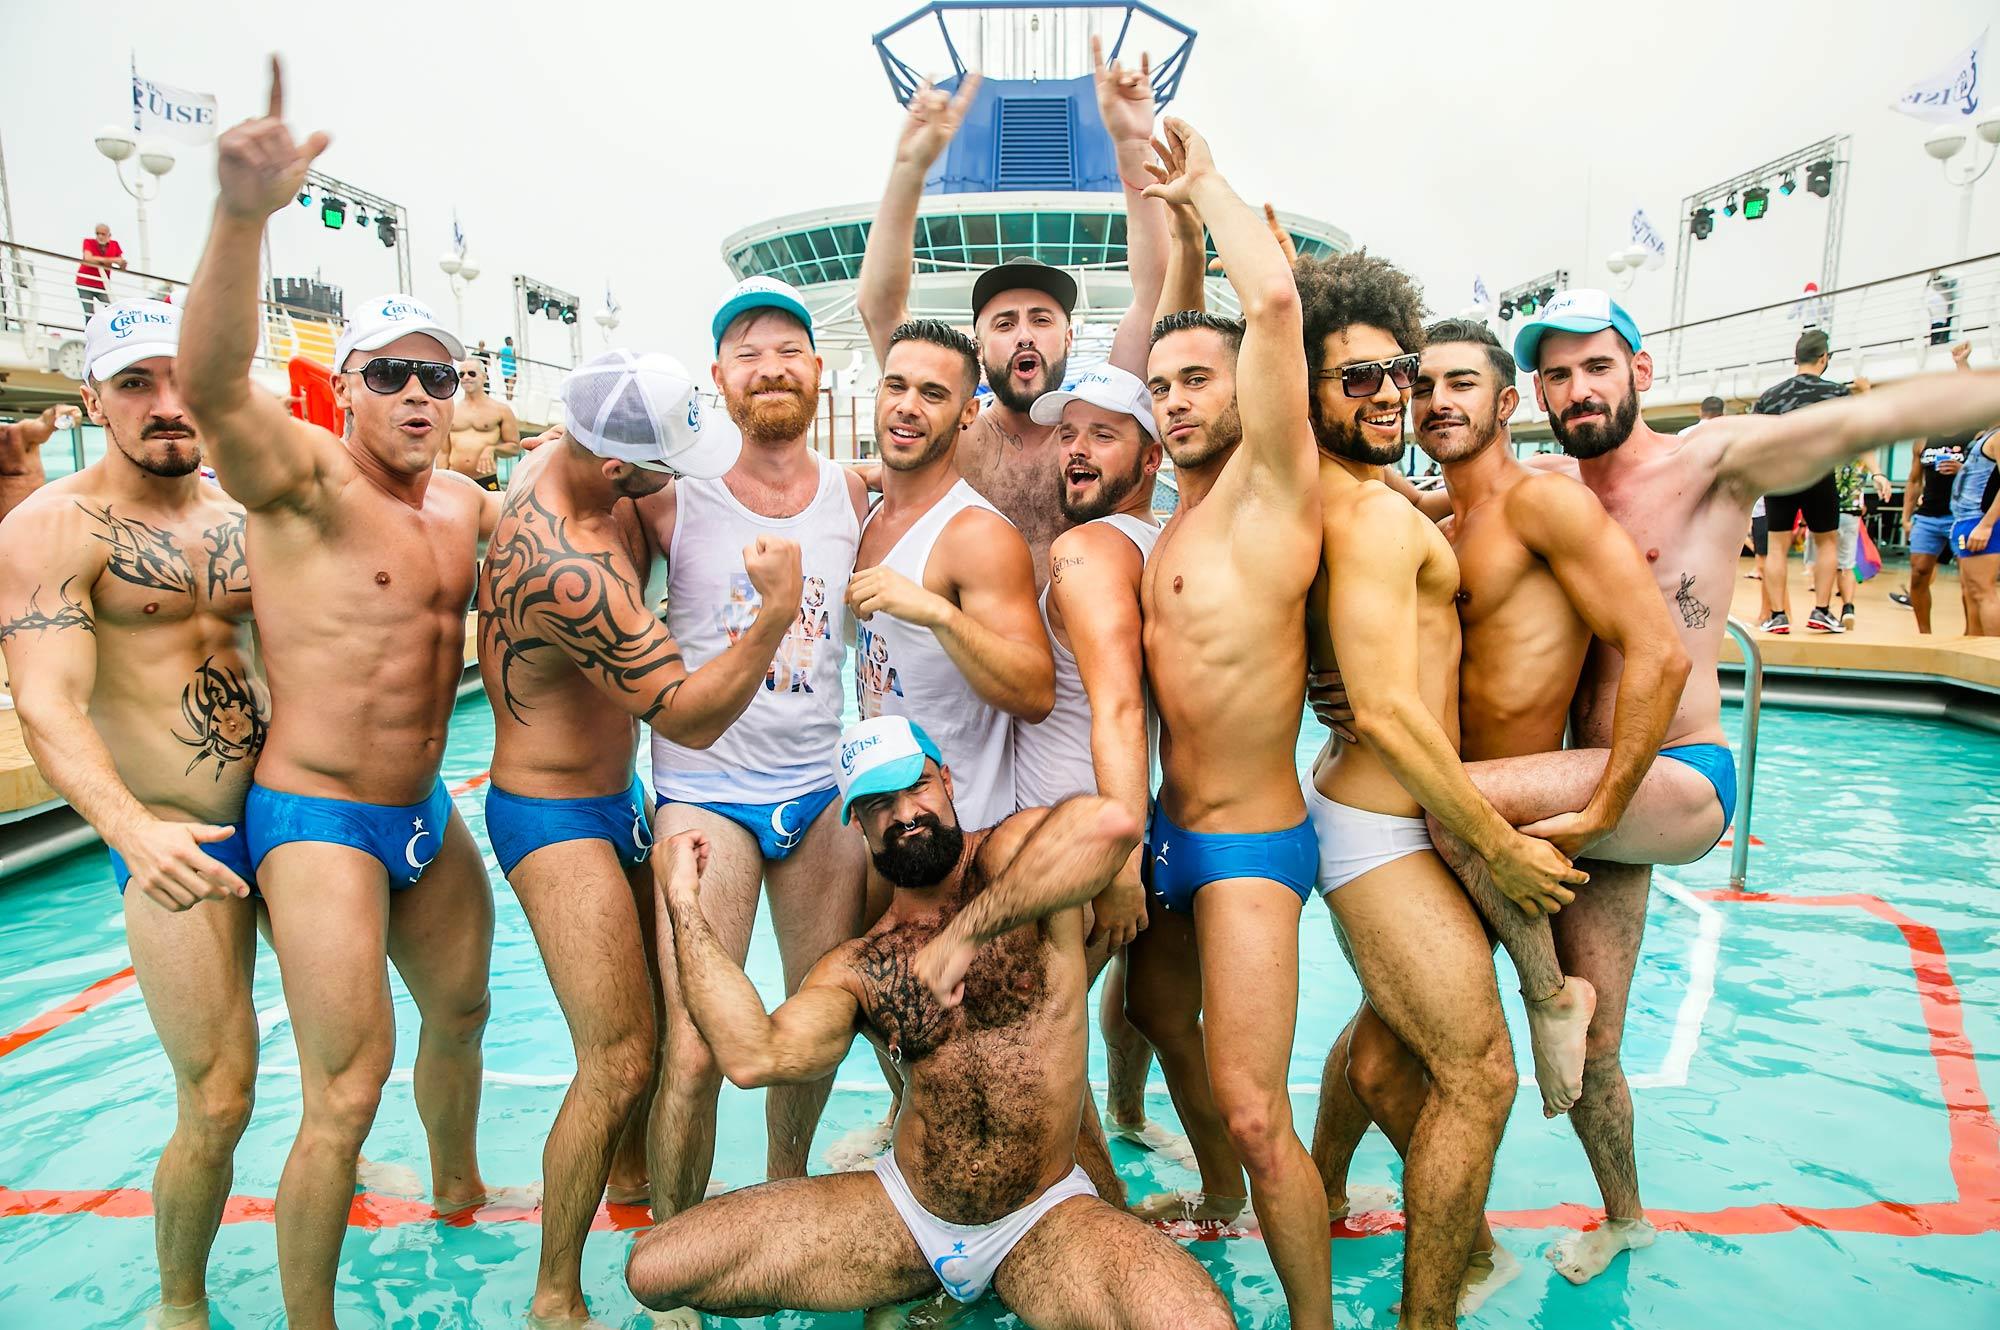 Tagebuch Schwule Kreuzfahrt The Cruise 2017 Tagebuch Europäische Schwulen Kreuzfahrt Gay Couple Travel Diary The Cruise 2017 © CoupleofMen.com